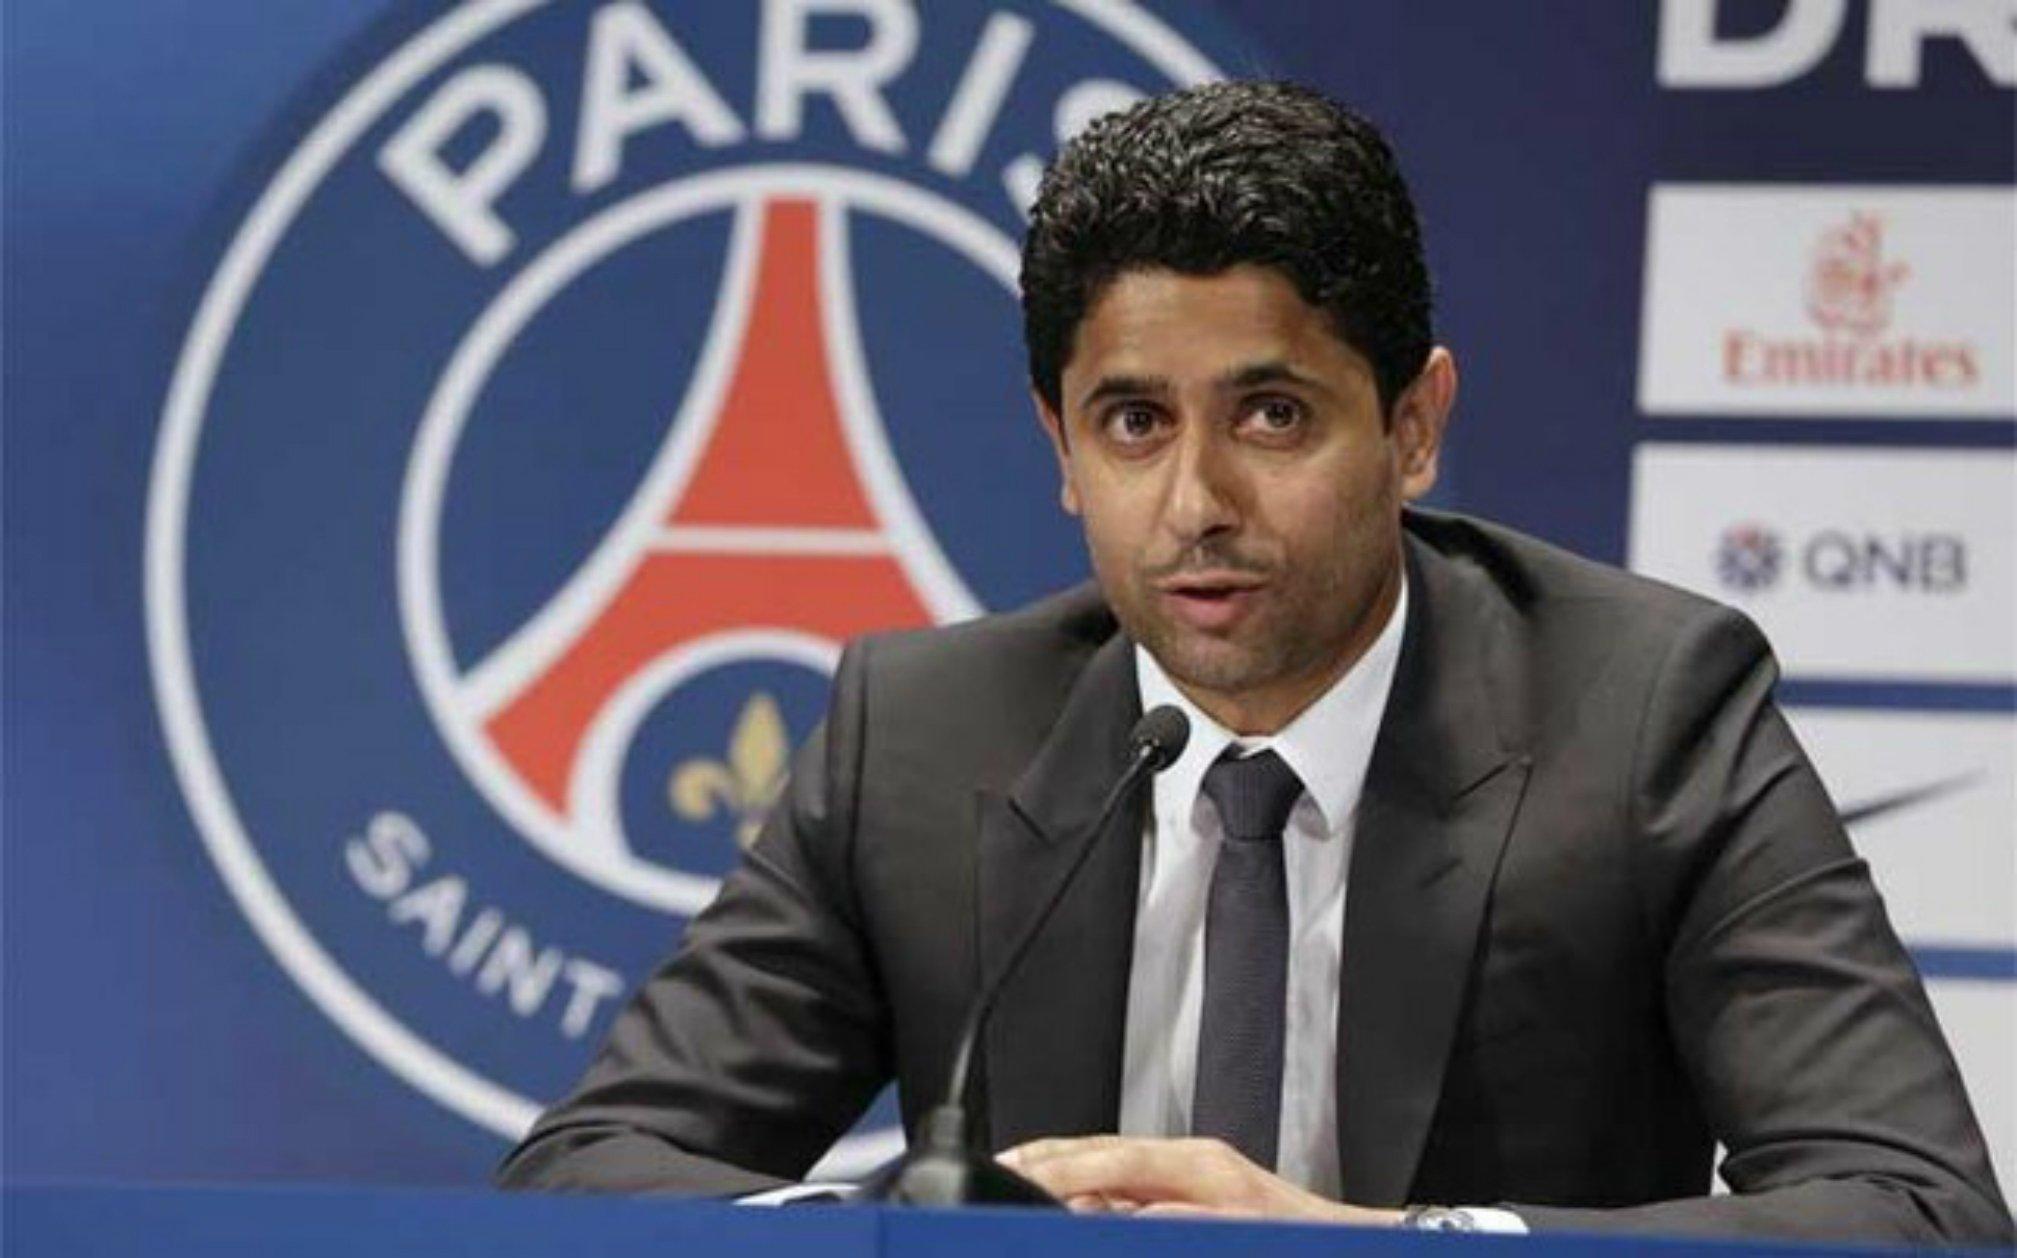 PSG, Fair Play financiero, Javier Tebas, Champions League, UEFA, Presidente, Al-Khelaïfi, Fichajes, Neymar, Mbappé